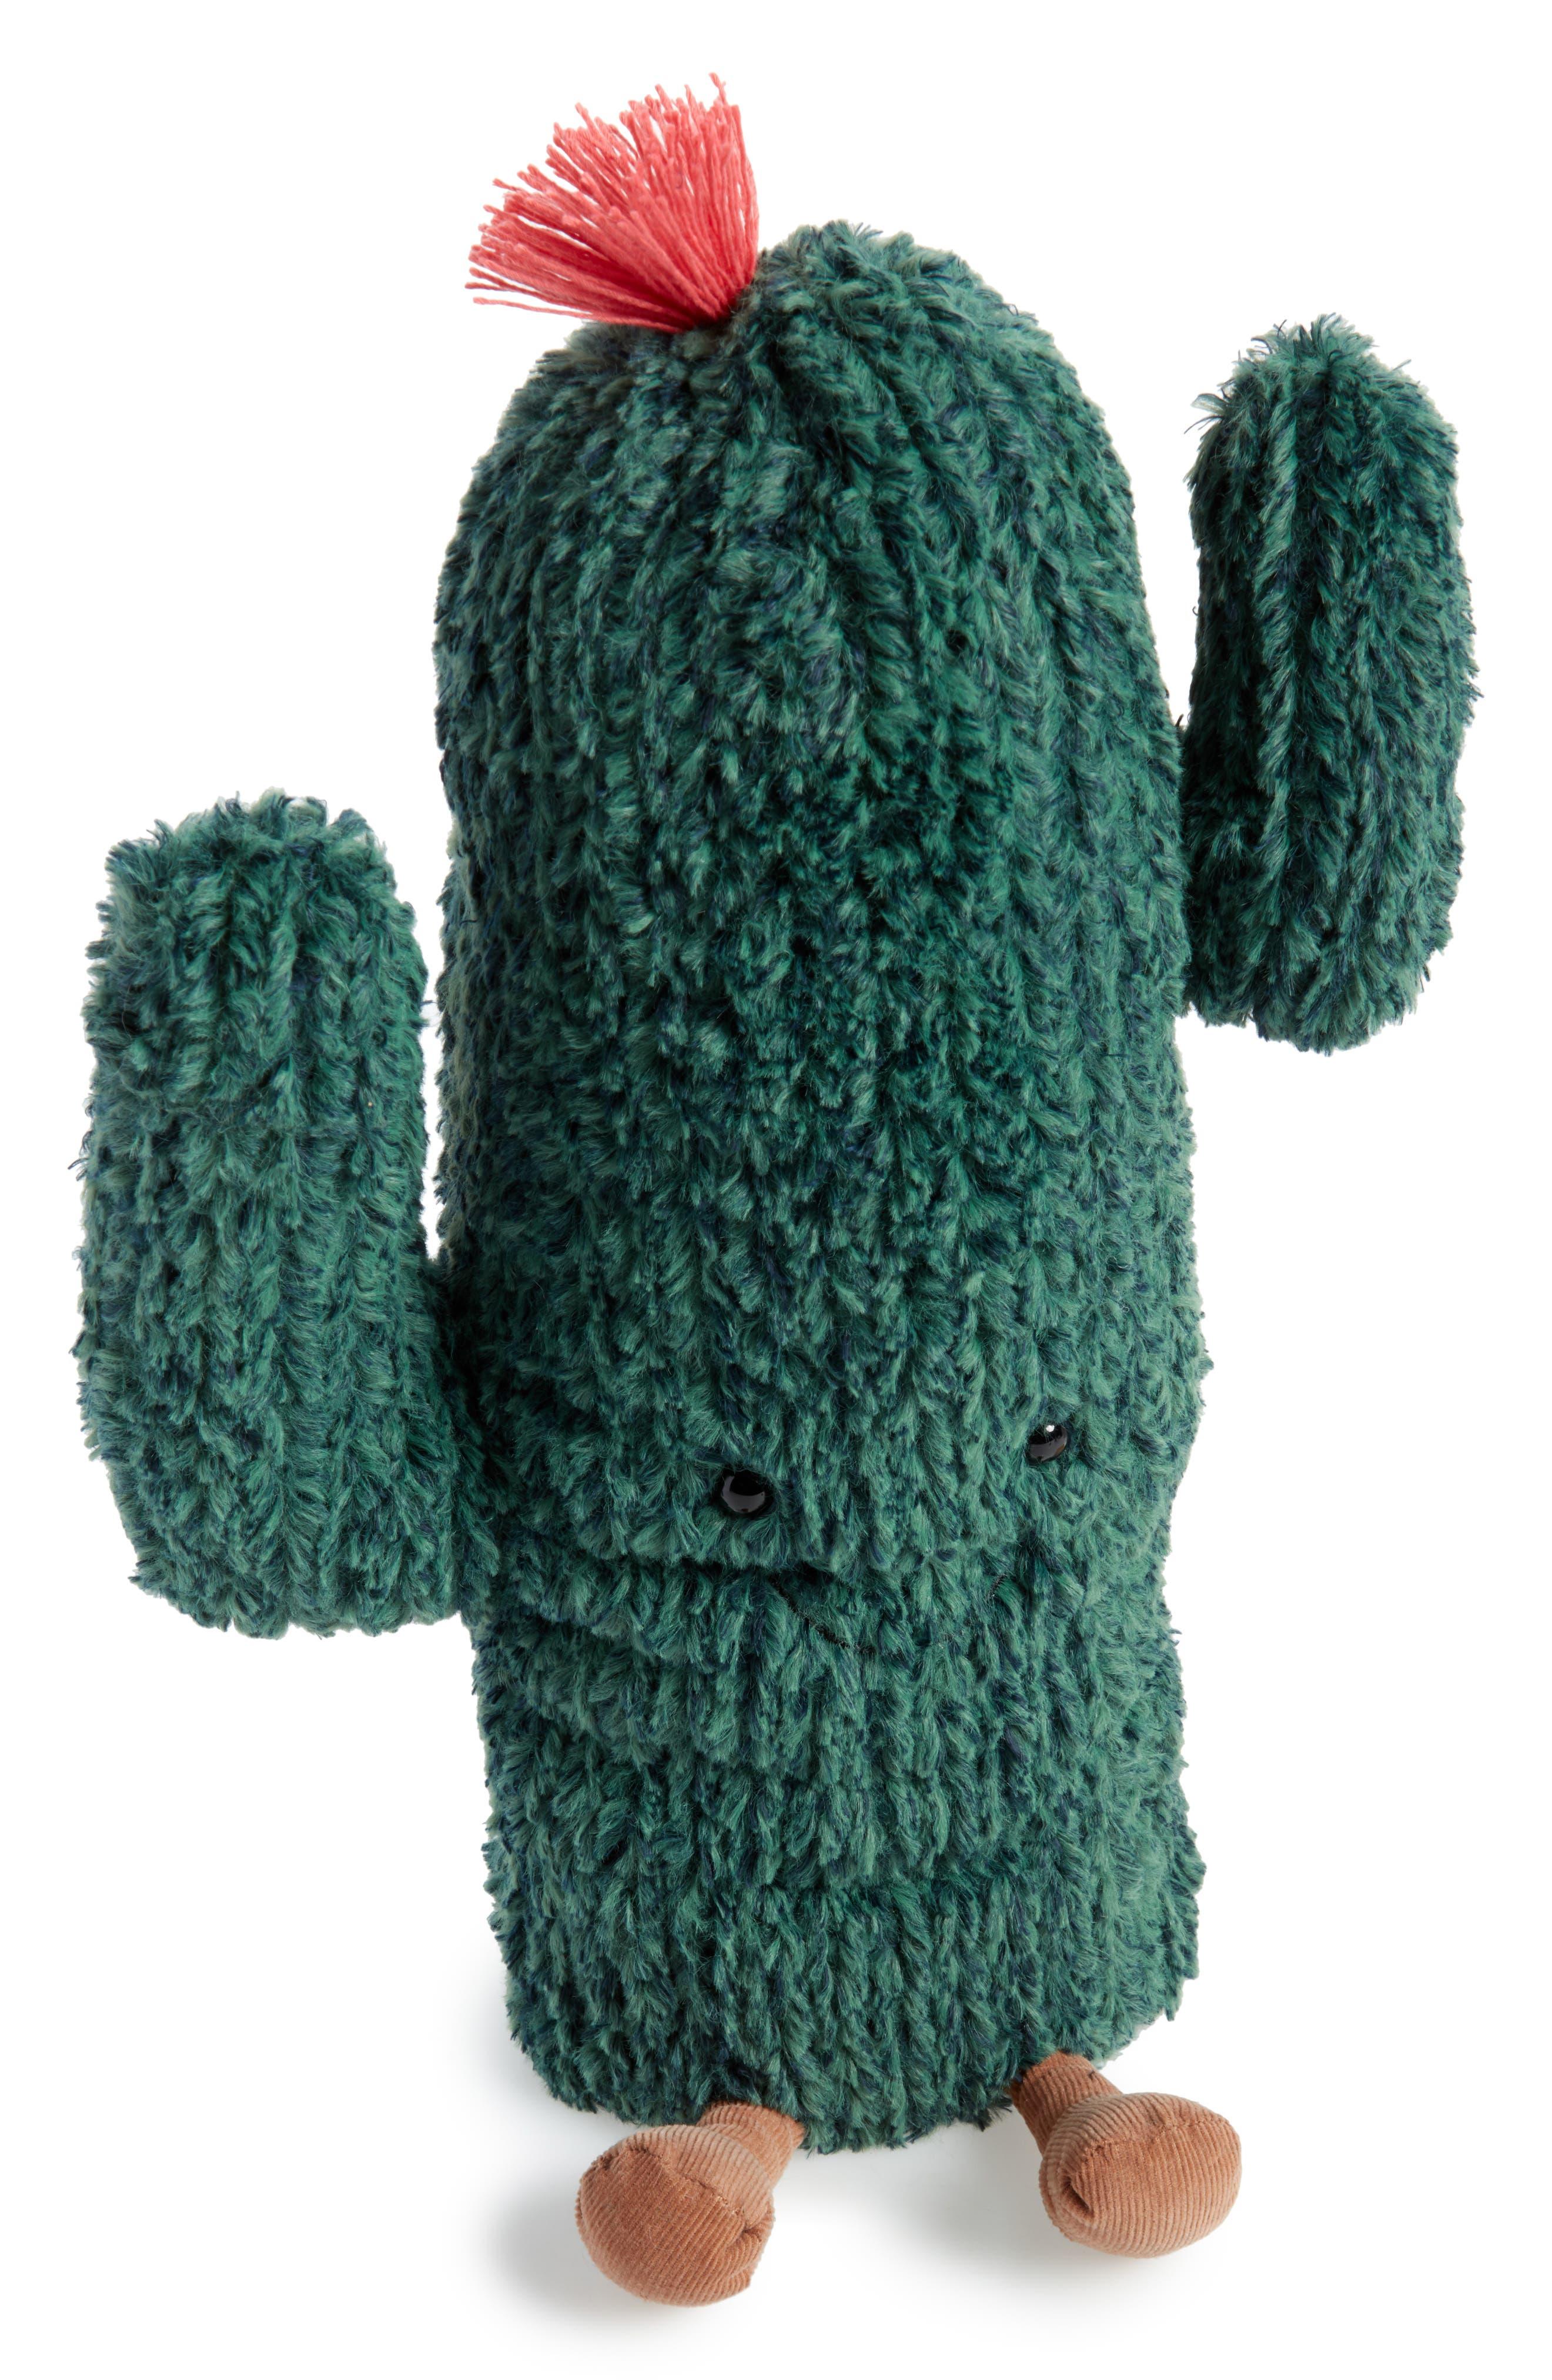 Amuseable Cactus Stuffed Toy,                             Main thumbnail 1, color,                             Cactus